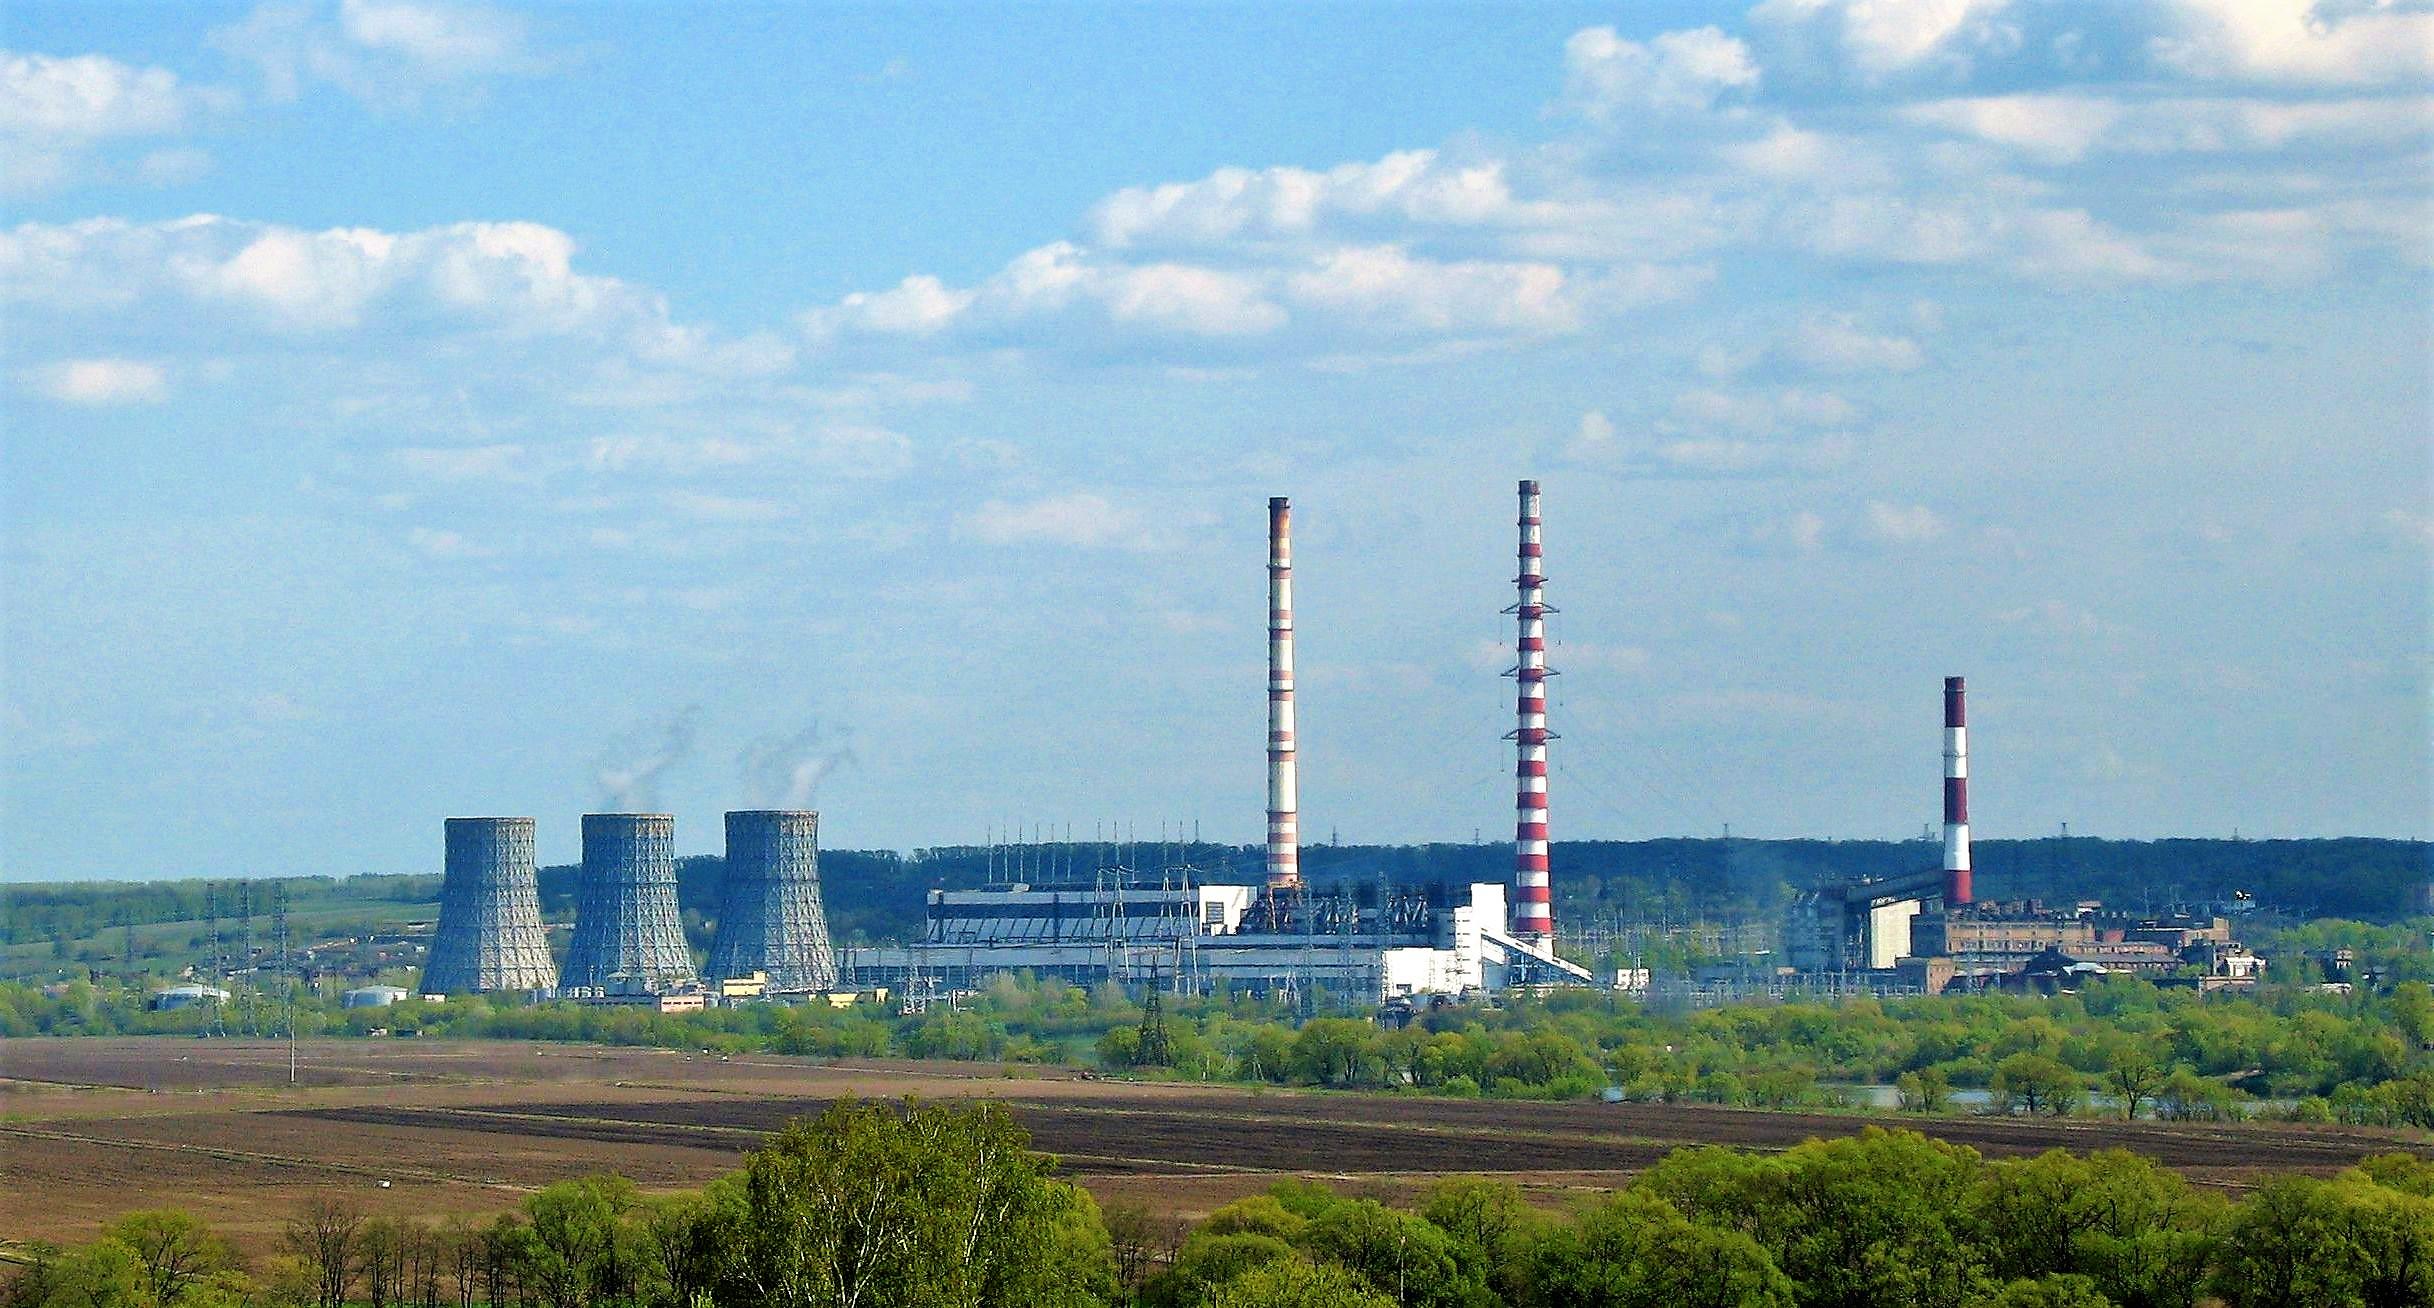 https://upload.wikimedia.org/wikipedia/commons/d/d1/Kashira_Power_Plant_%2801%29.jpg